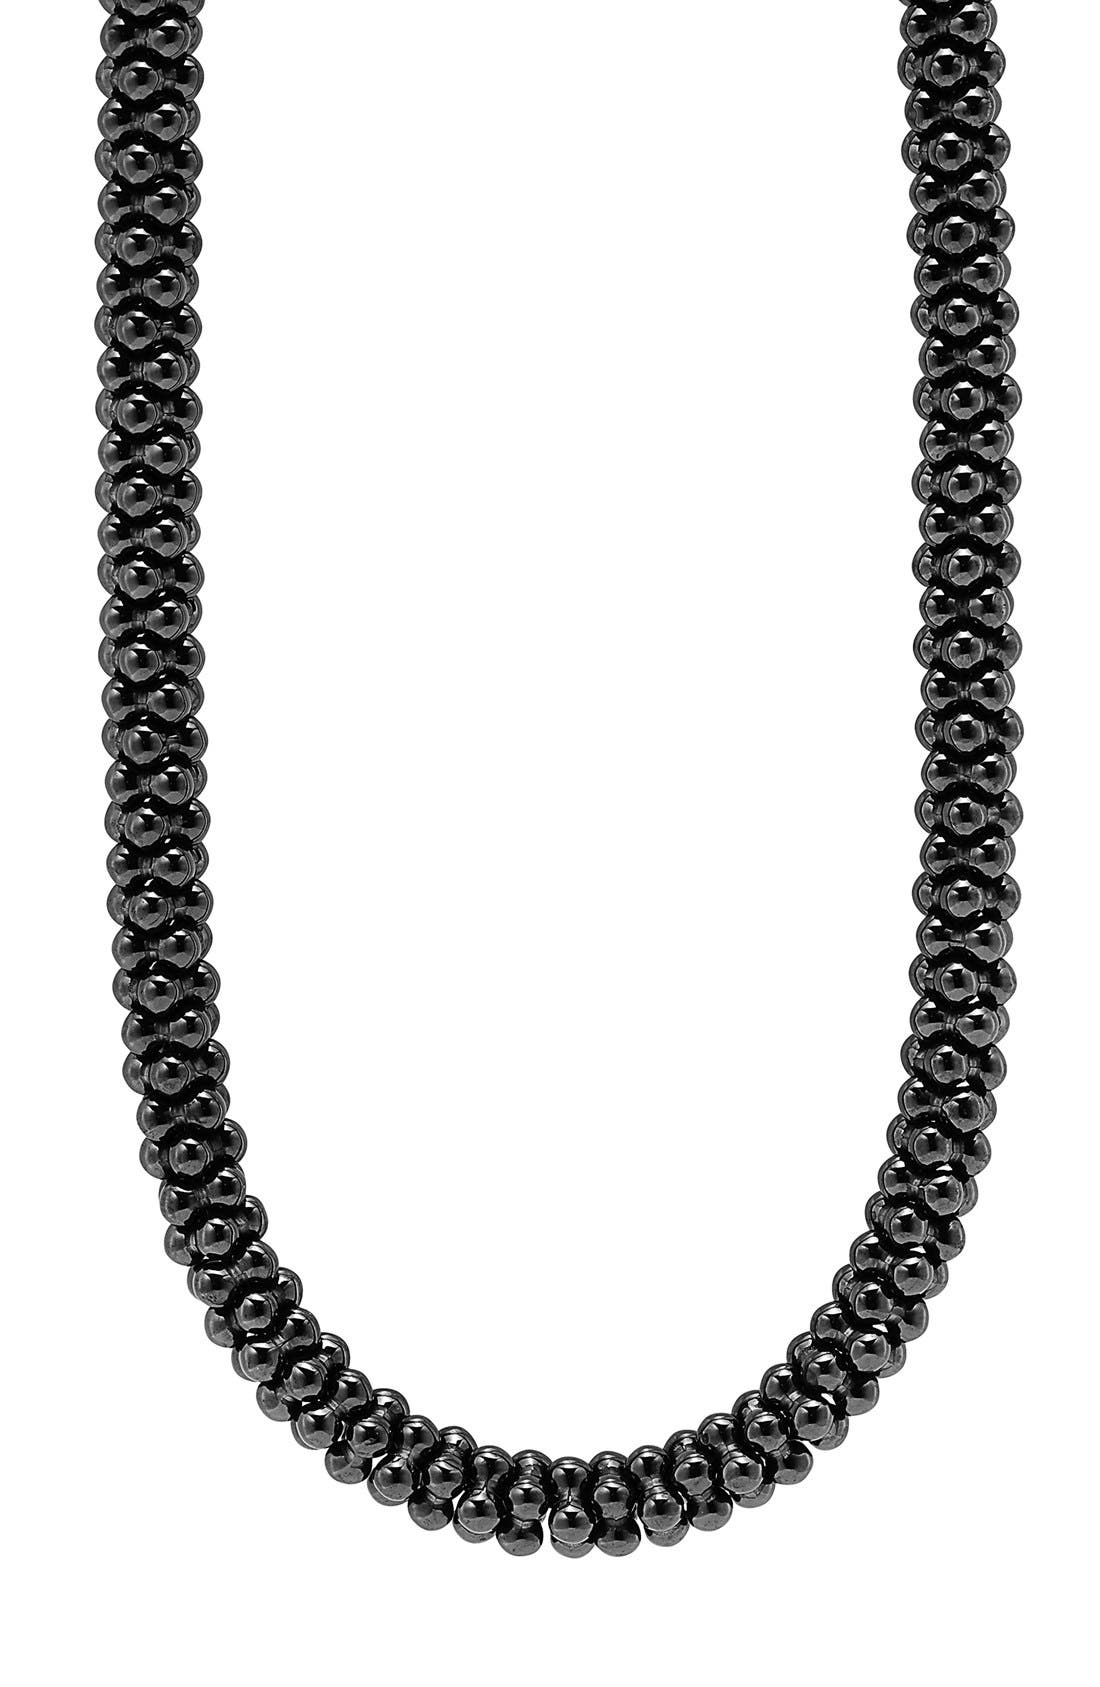 'Black Caviar' 7mm Beaded Necklace,                             Alternate thumbnail 3, color,                             BLACK CAVIAR